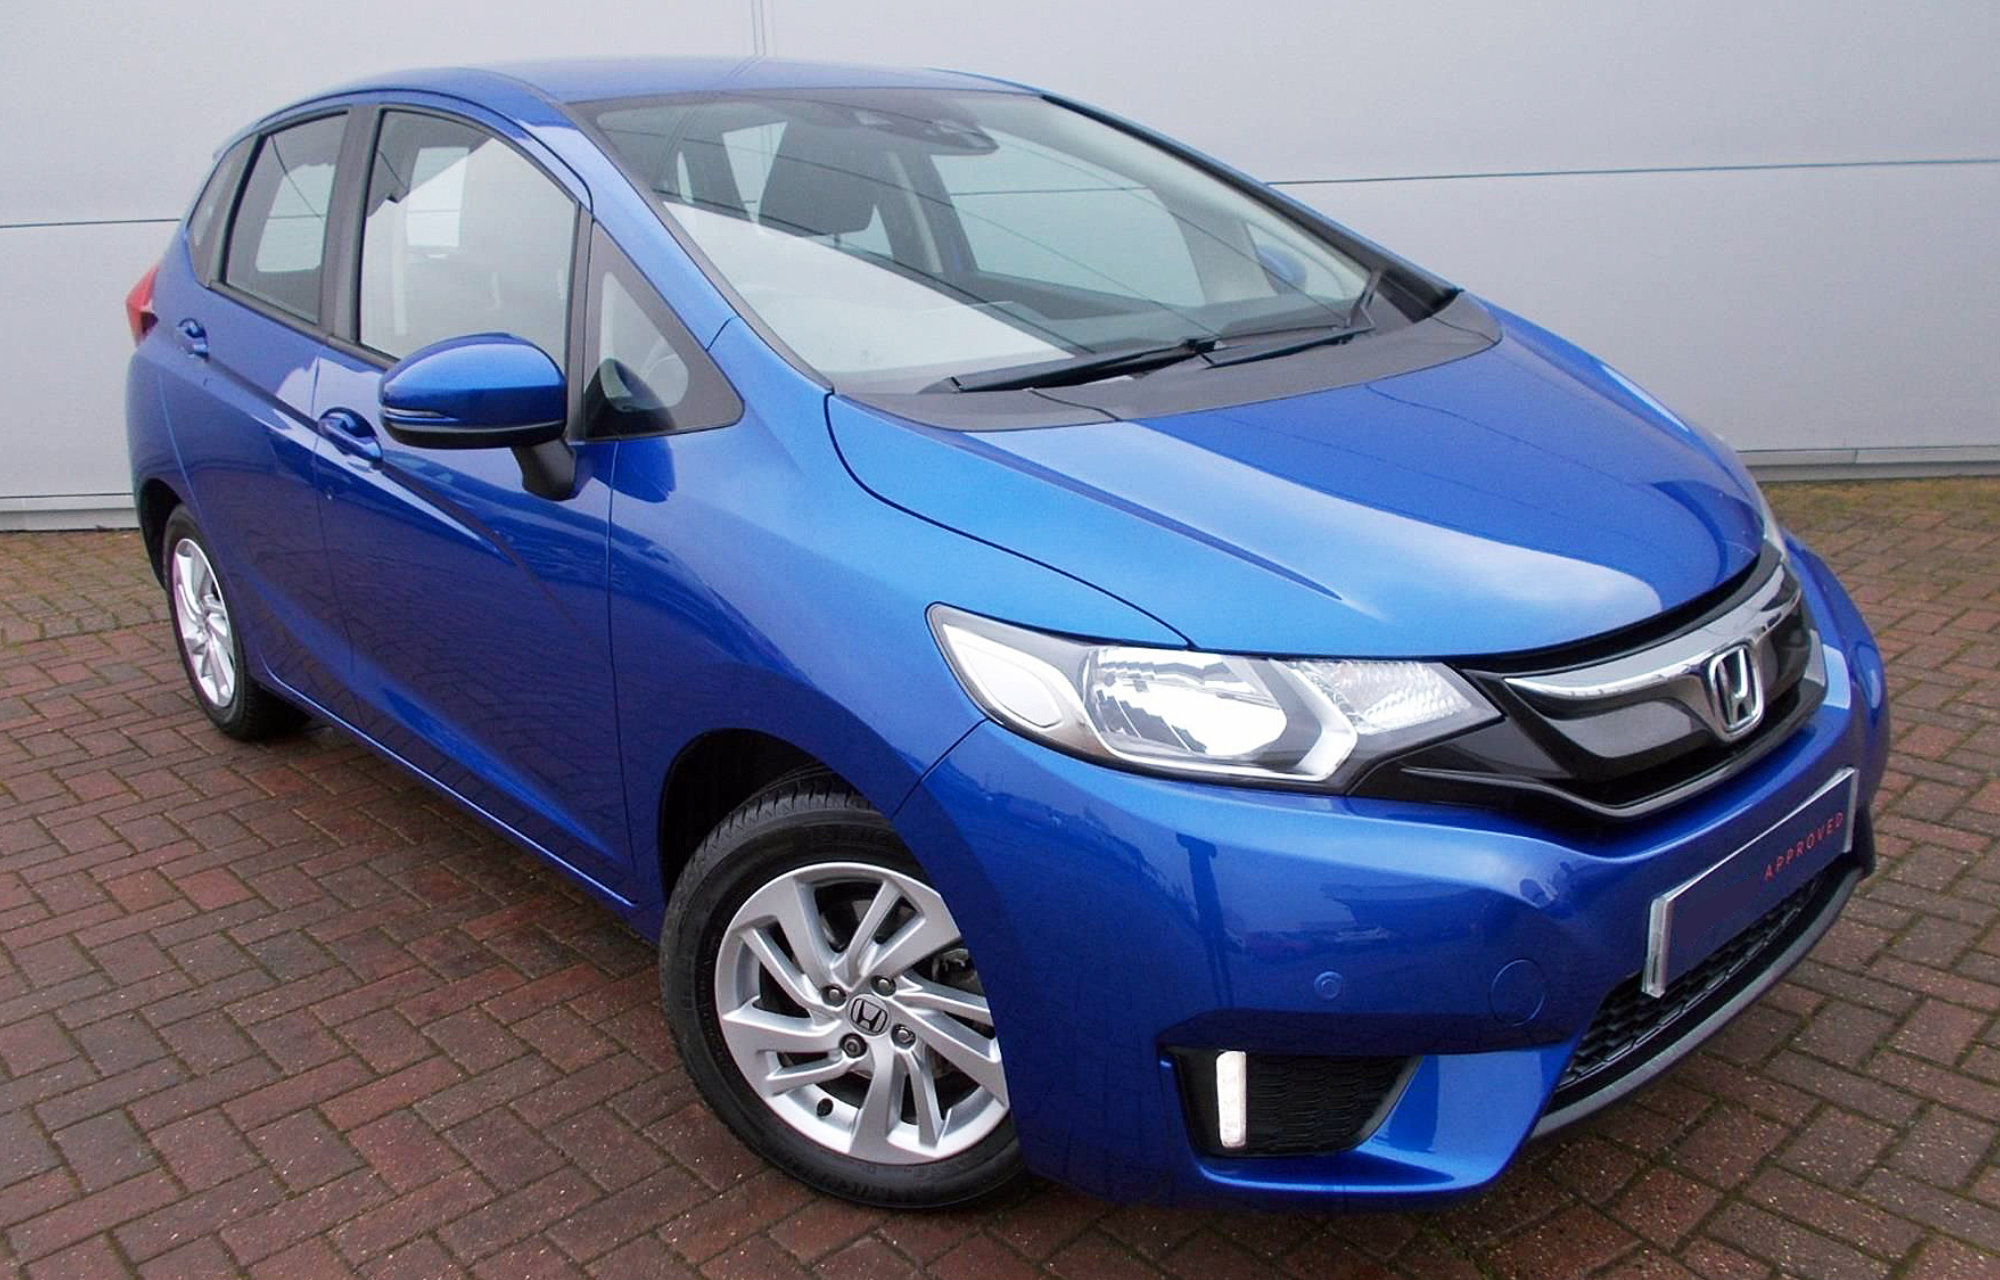 2020 (202) Honda Jazz 1.3 Petrol SE